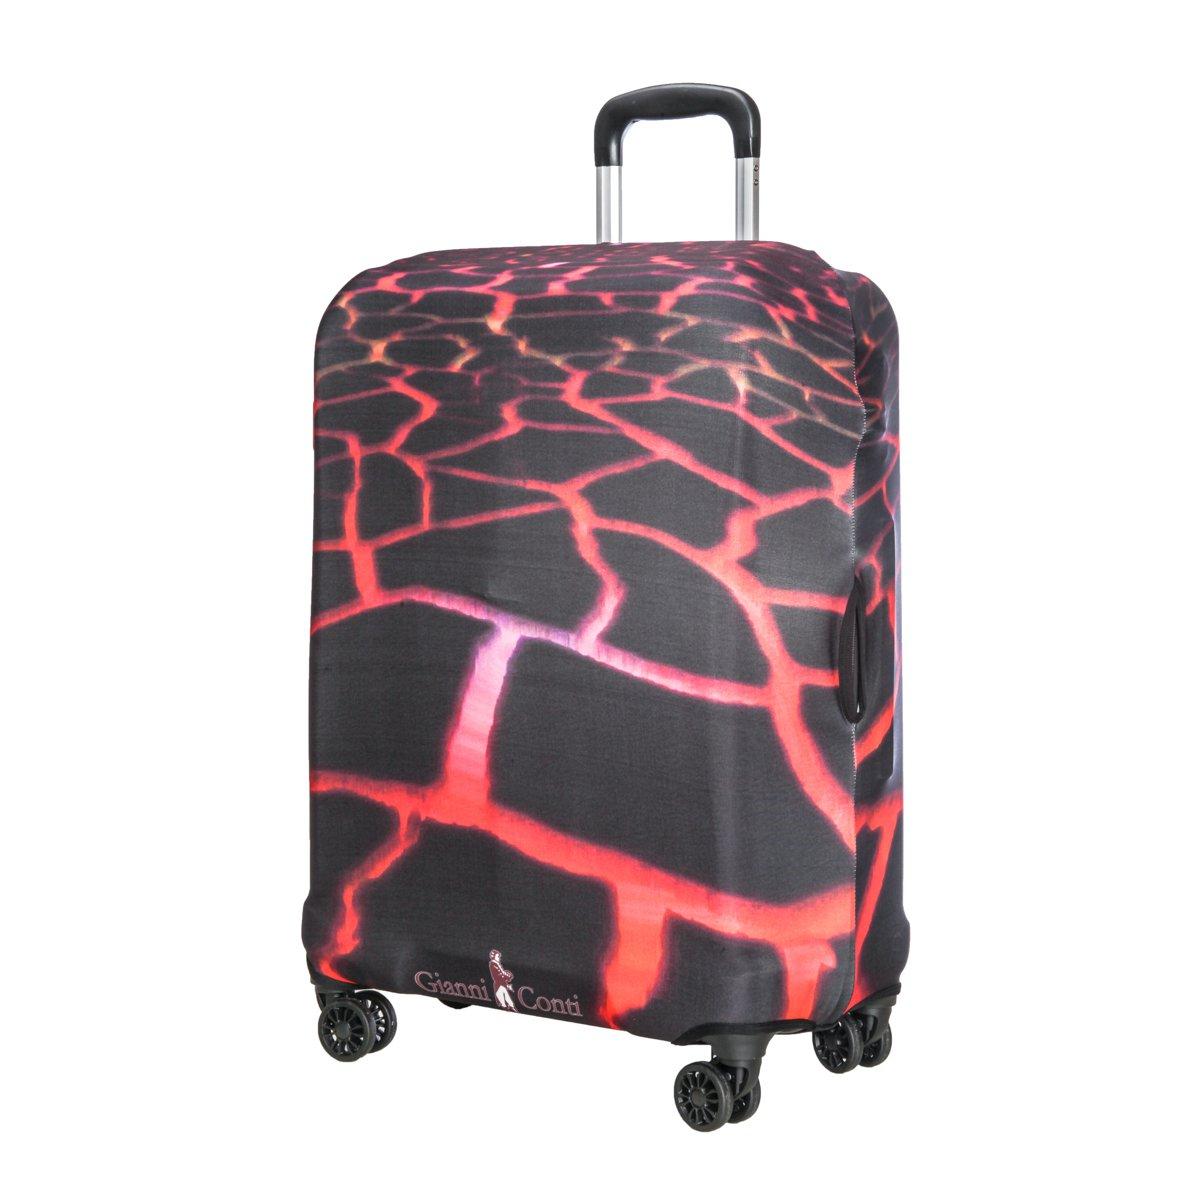 Защитное покрытие для чемодана Gianni Conti 9038 S.